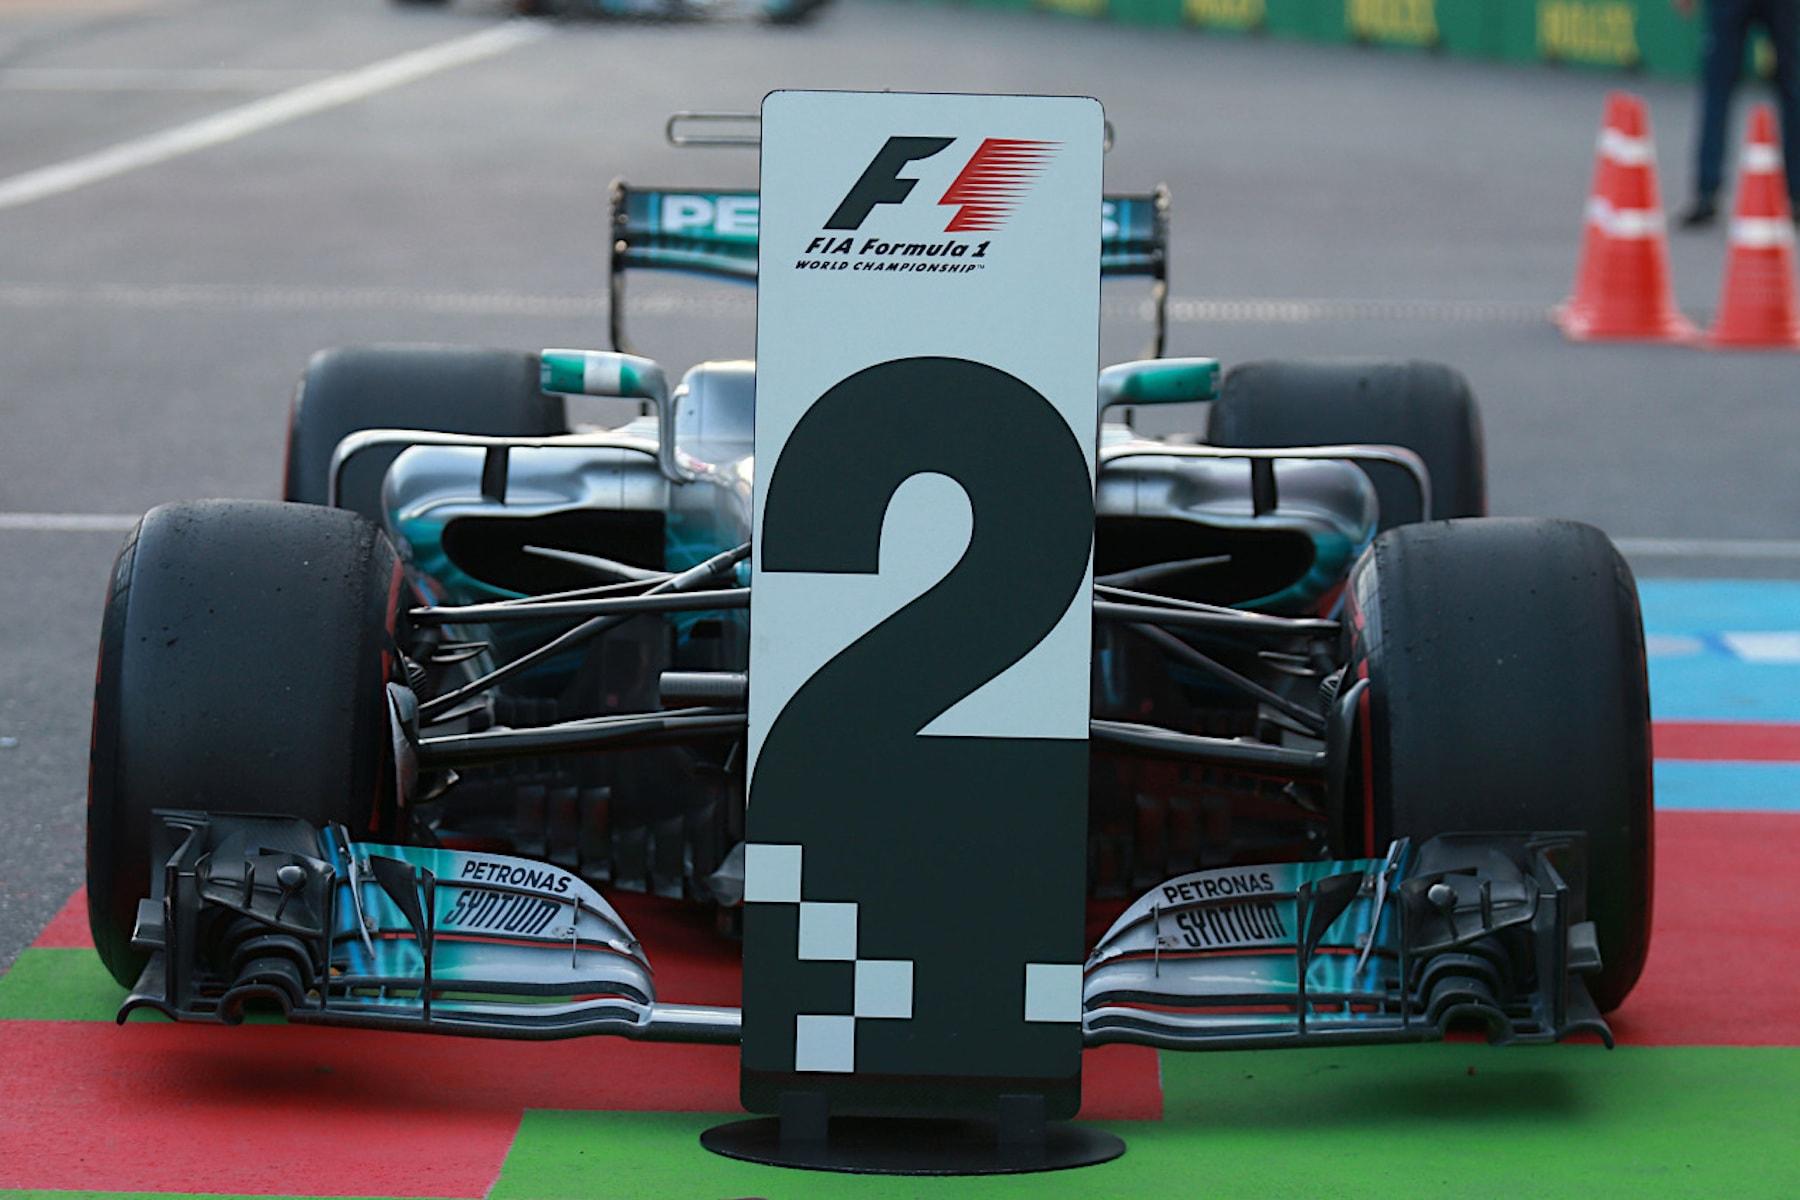 U 2017 Valtteri Bottas | Mercedes W08 | 2017 Azerbaijan GP P2 4 copy.jpg